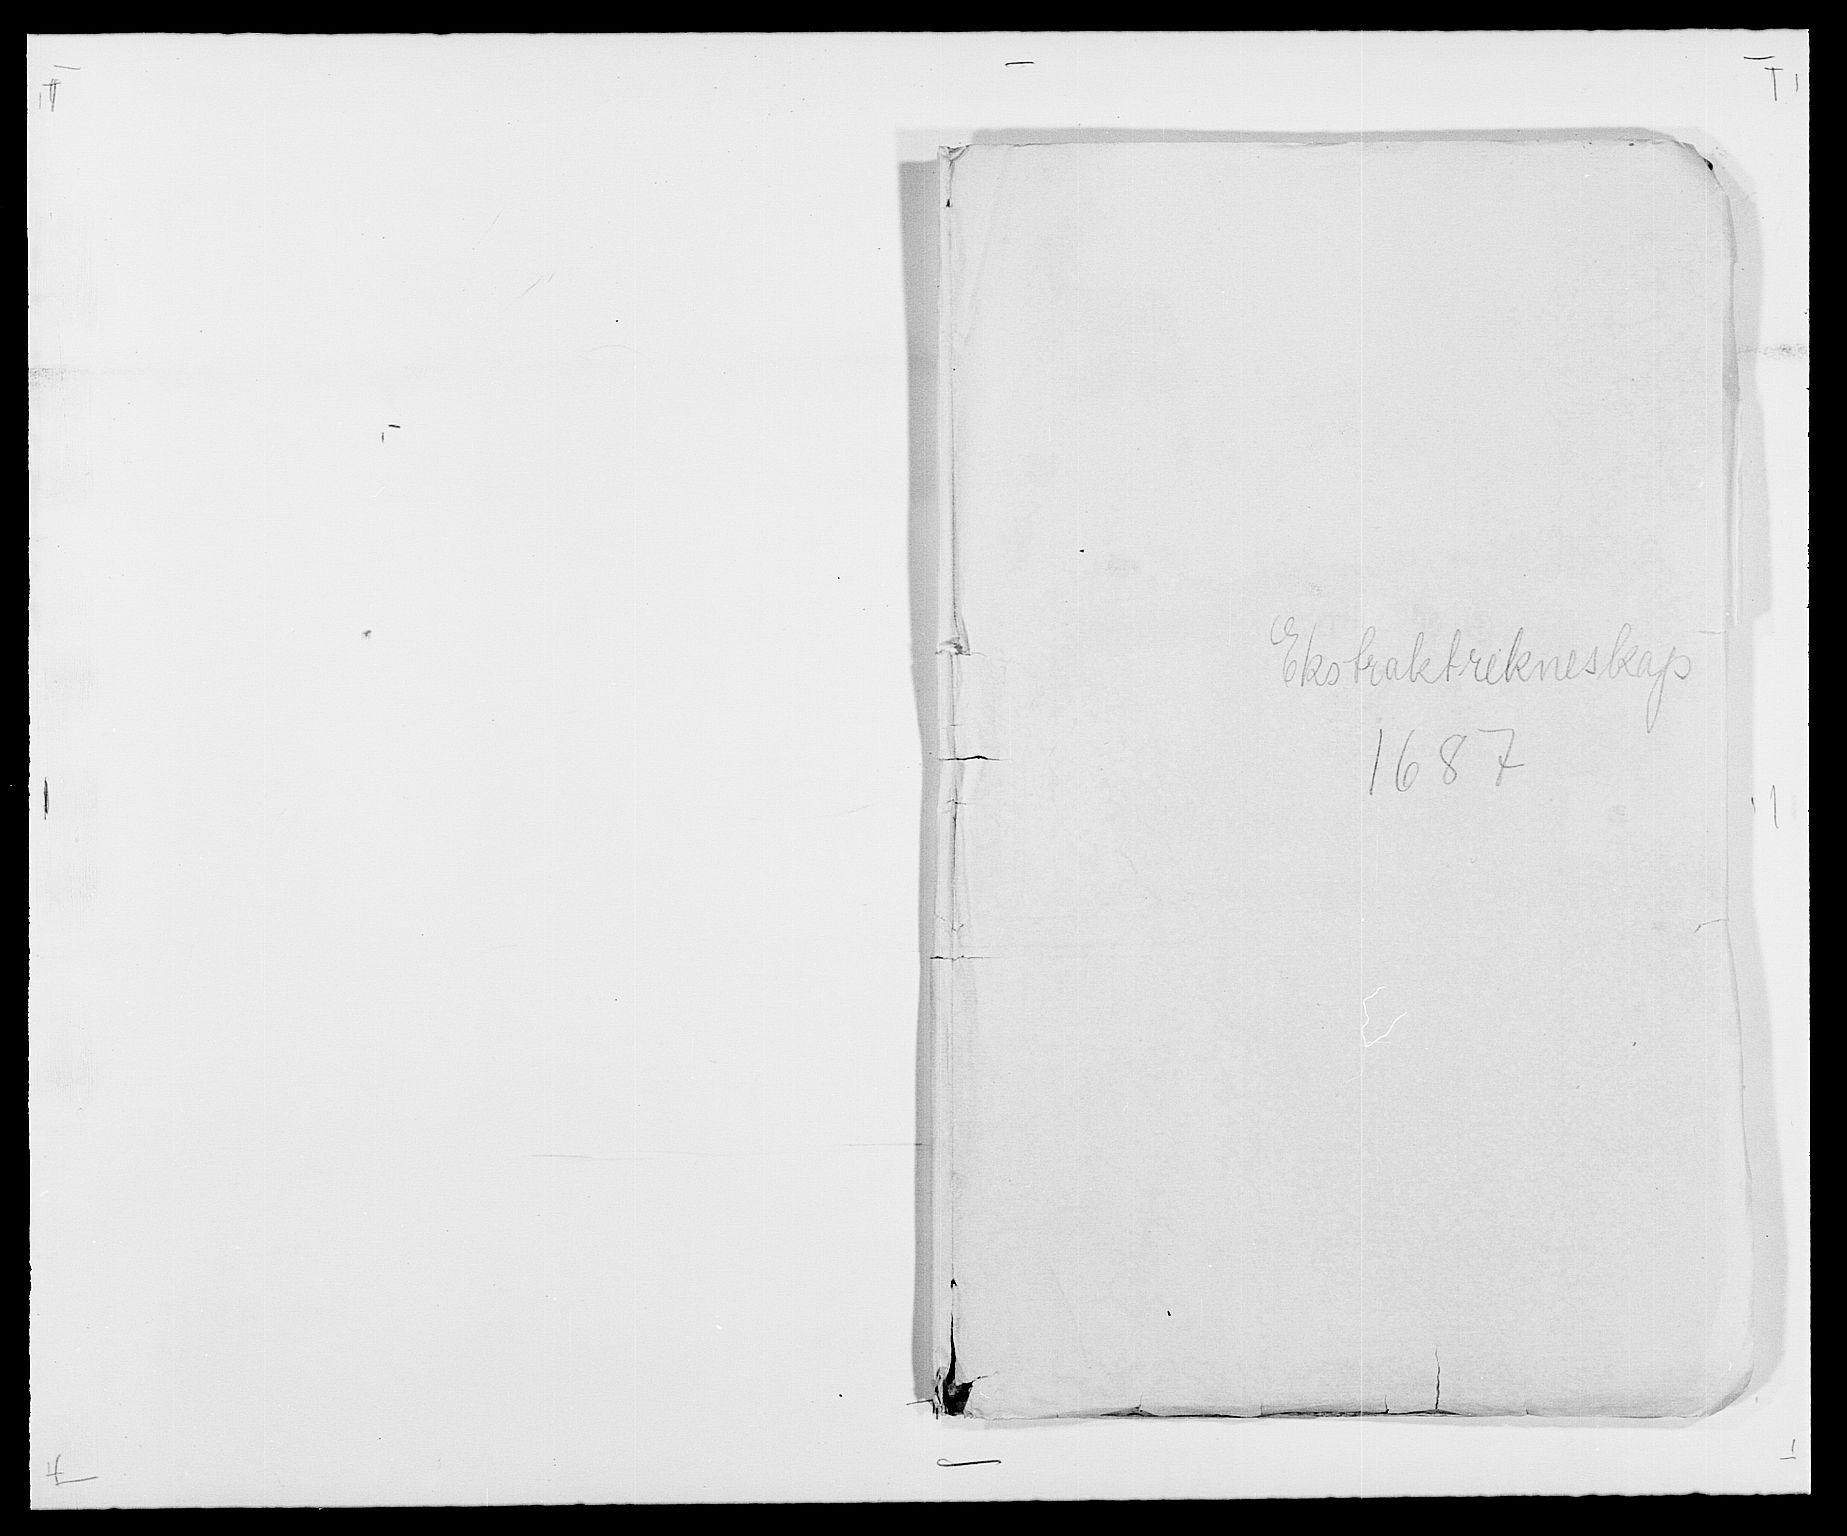 RA, Rentekammeret inntil 1814, Reviderte regnskaper, Fogderegnskap, R63/L4306: Fogderegnskap Inderøy, 1687-1689, s. 2